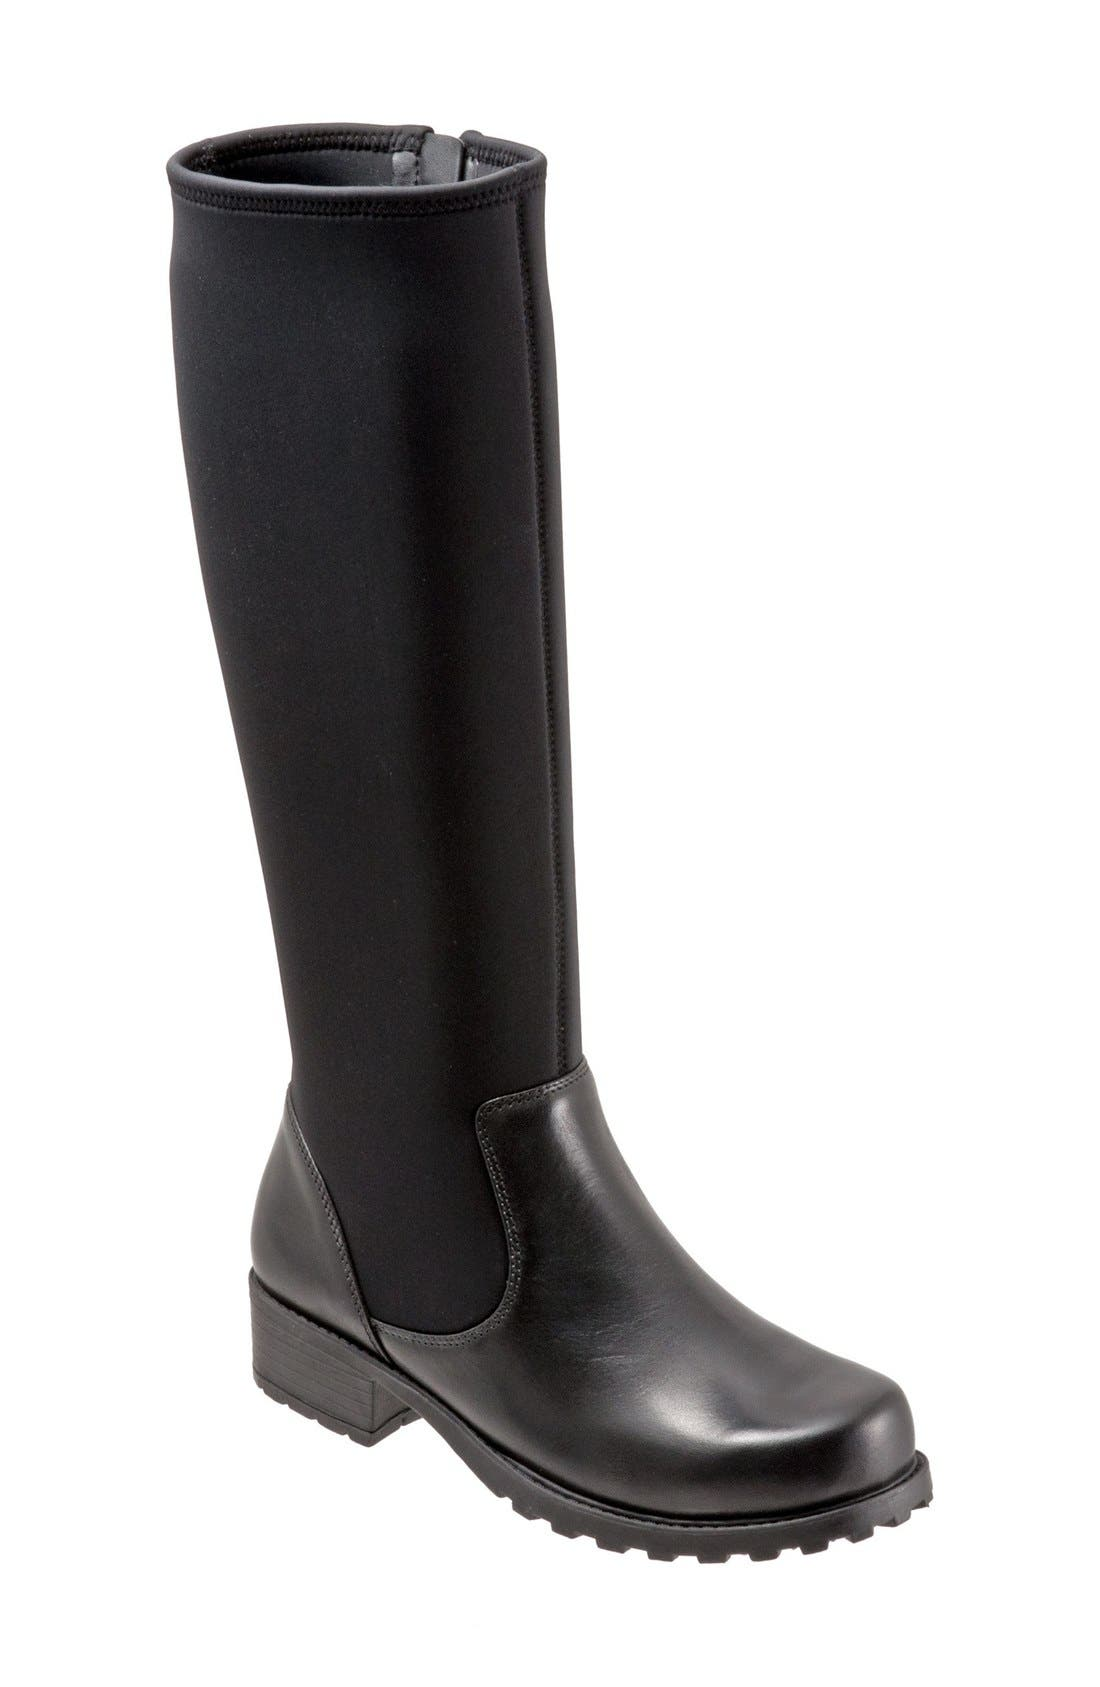 'Biloxi' Boot,                         Main,                         color, Black/ Black Leather